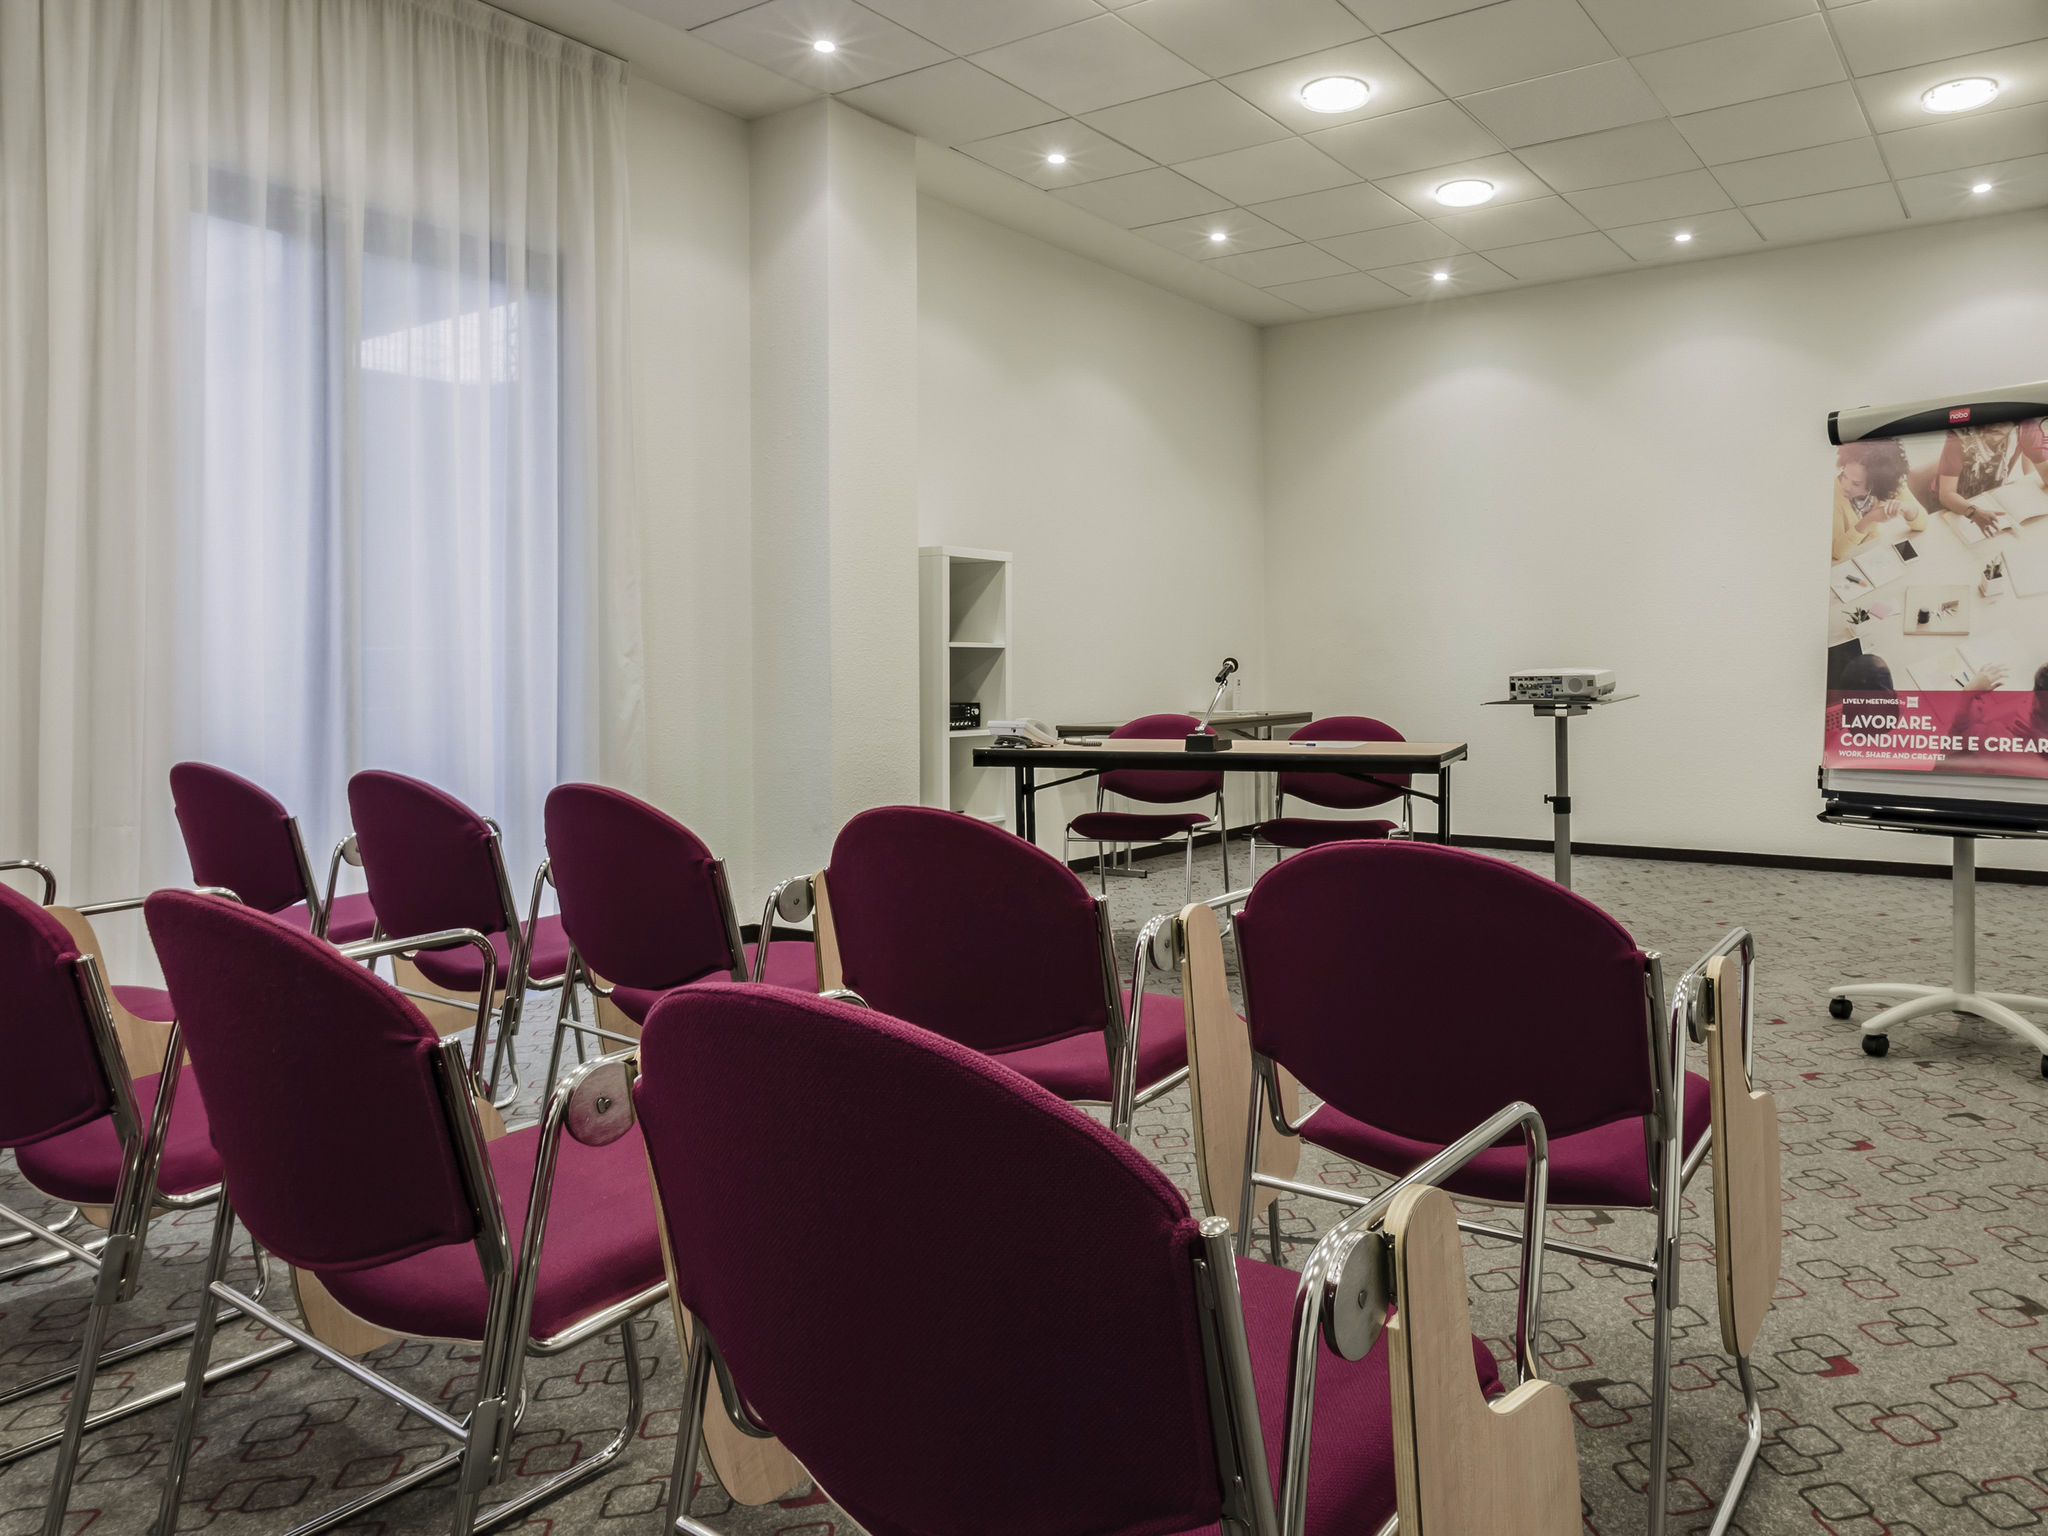 Sala Fumatori Malpensa : Hotel milano aeroporto ibis milano malpensa accorhotels